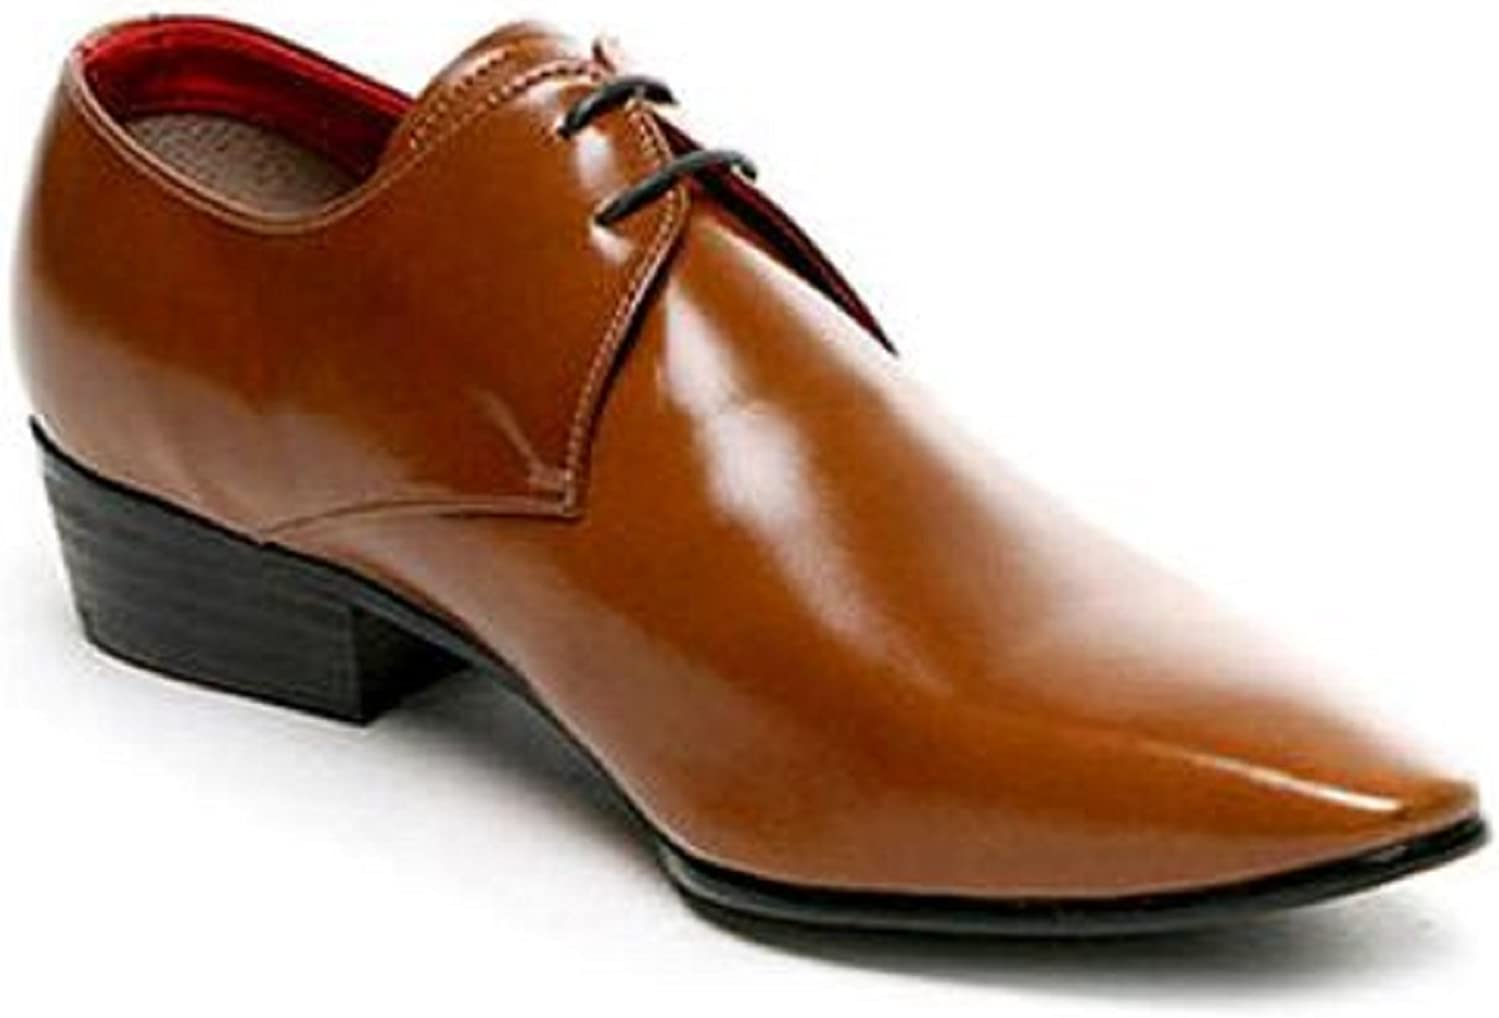 HAPPYSHOP TM Mens Leather British Business Derby Fresno San Francisco Mall Mall Style Suit Shoe